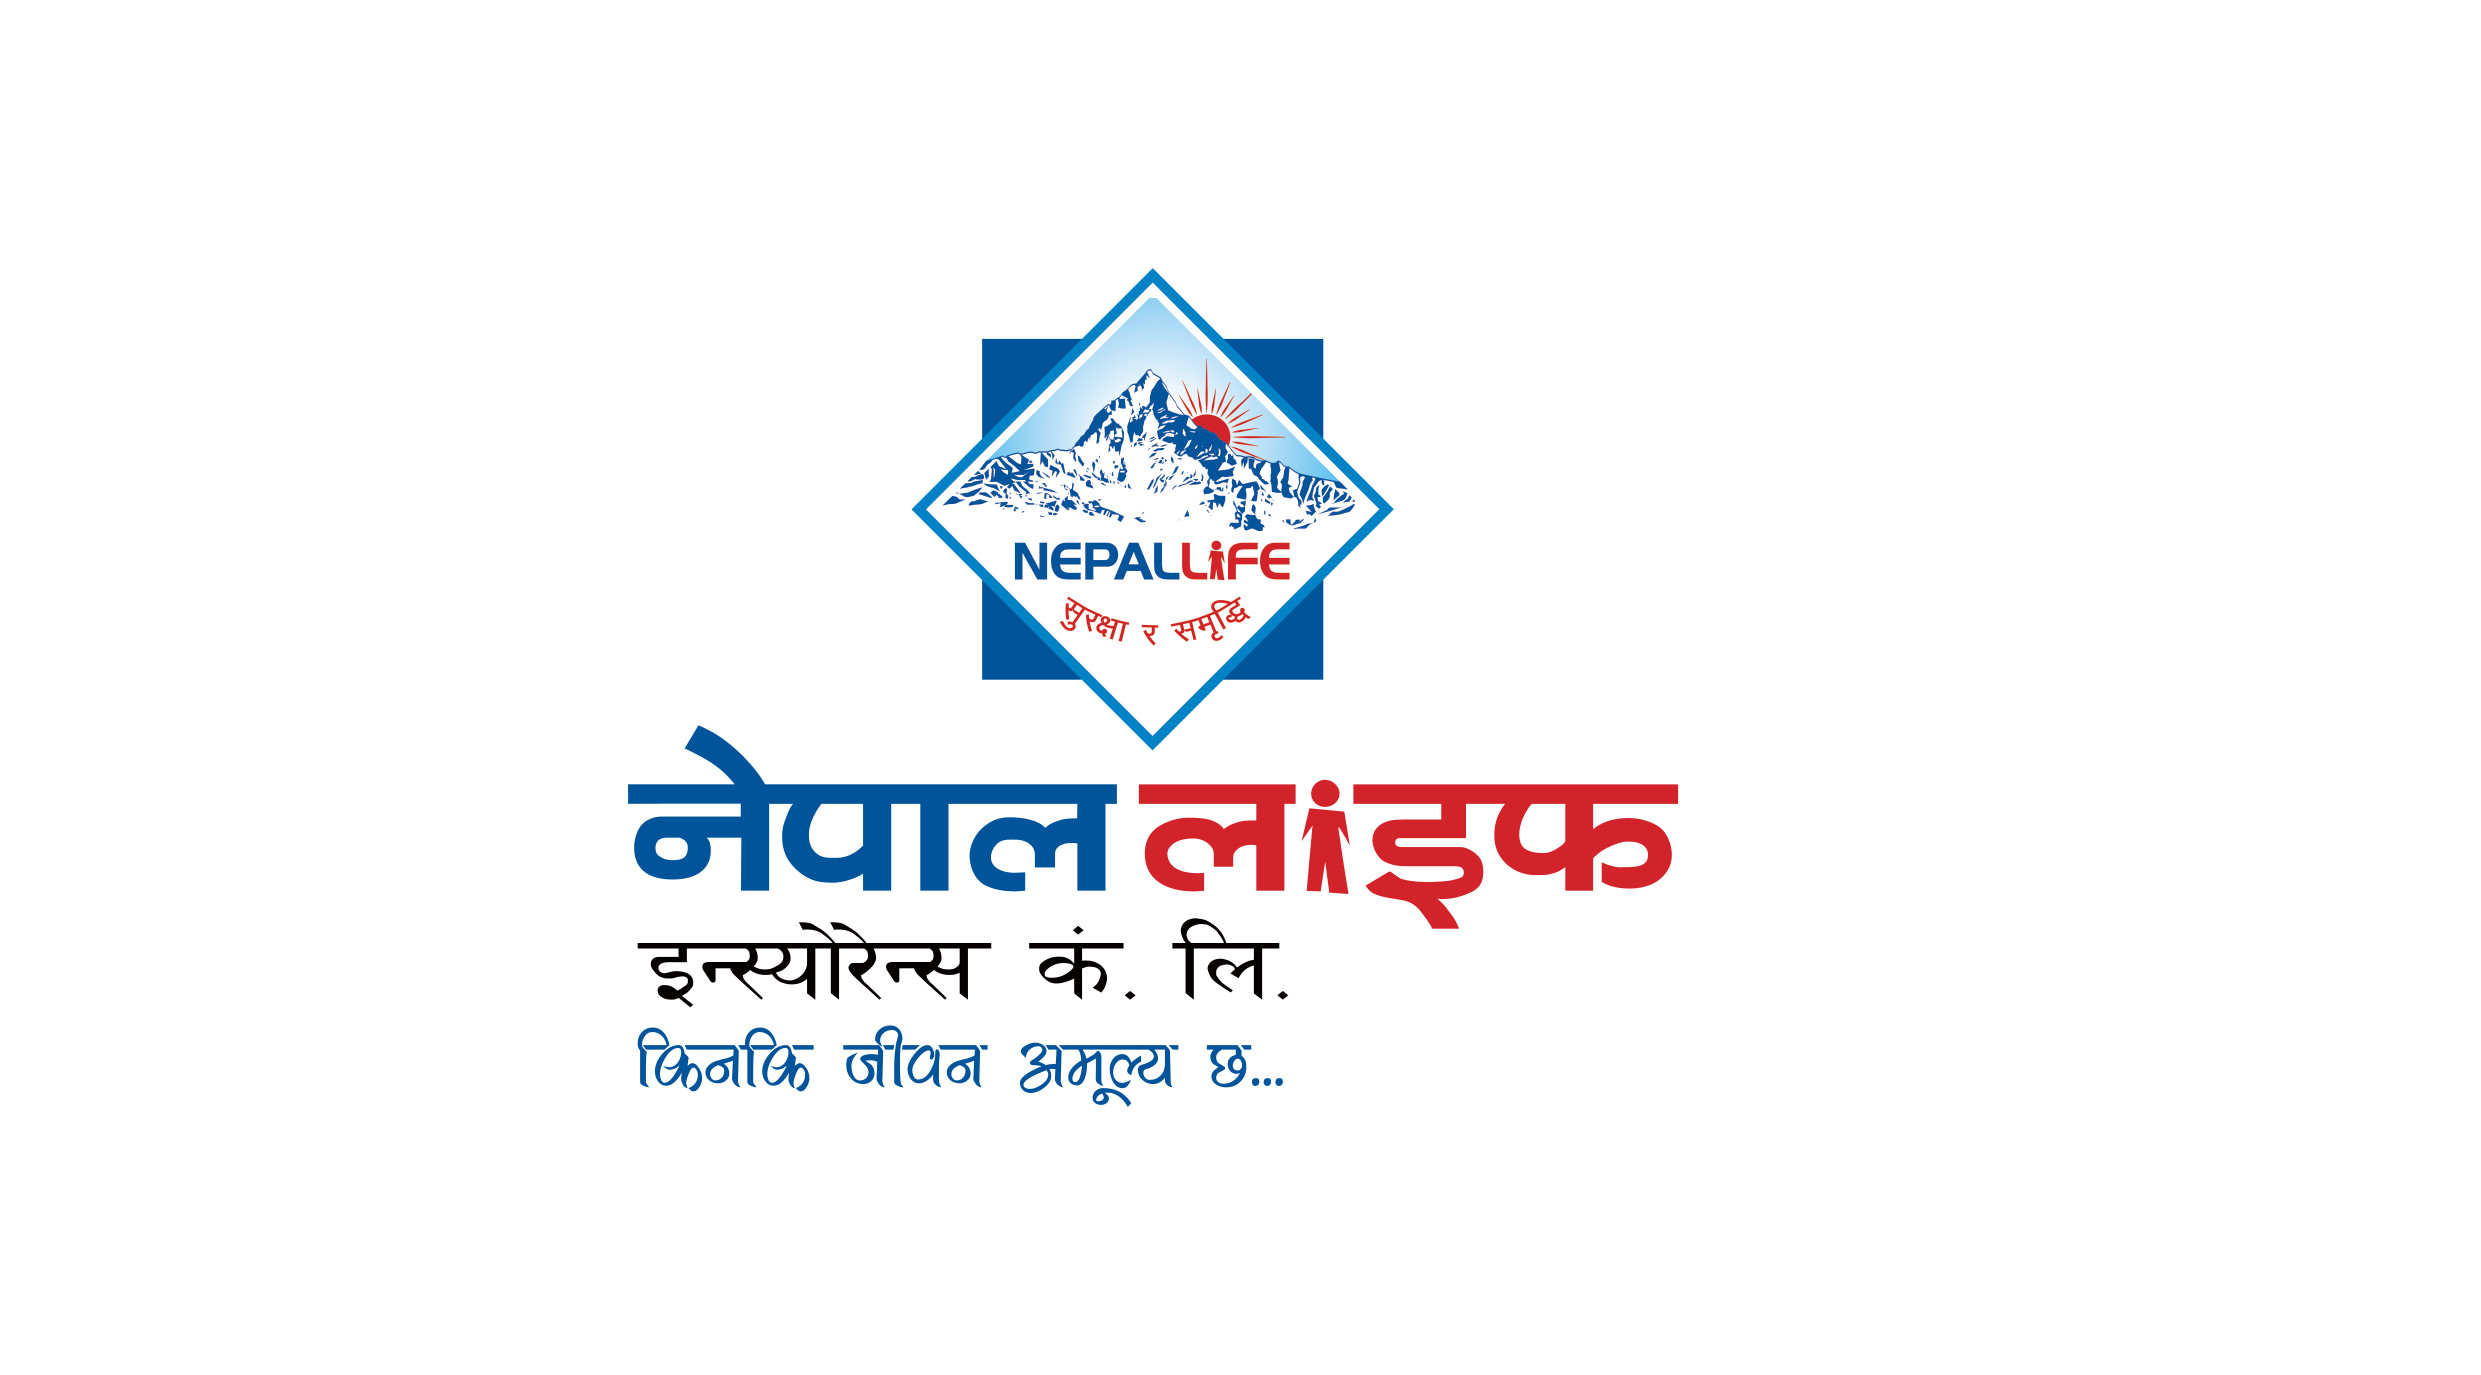 नेपाल लाईफद्धारा कोरोना भाइरस कोषमा १ करोड दिने घोषणा